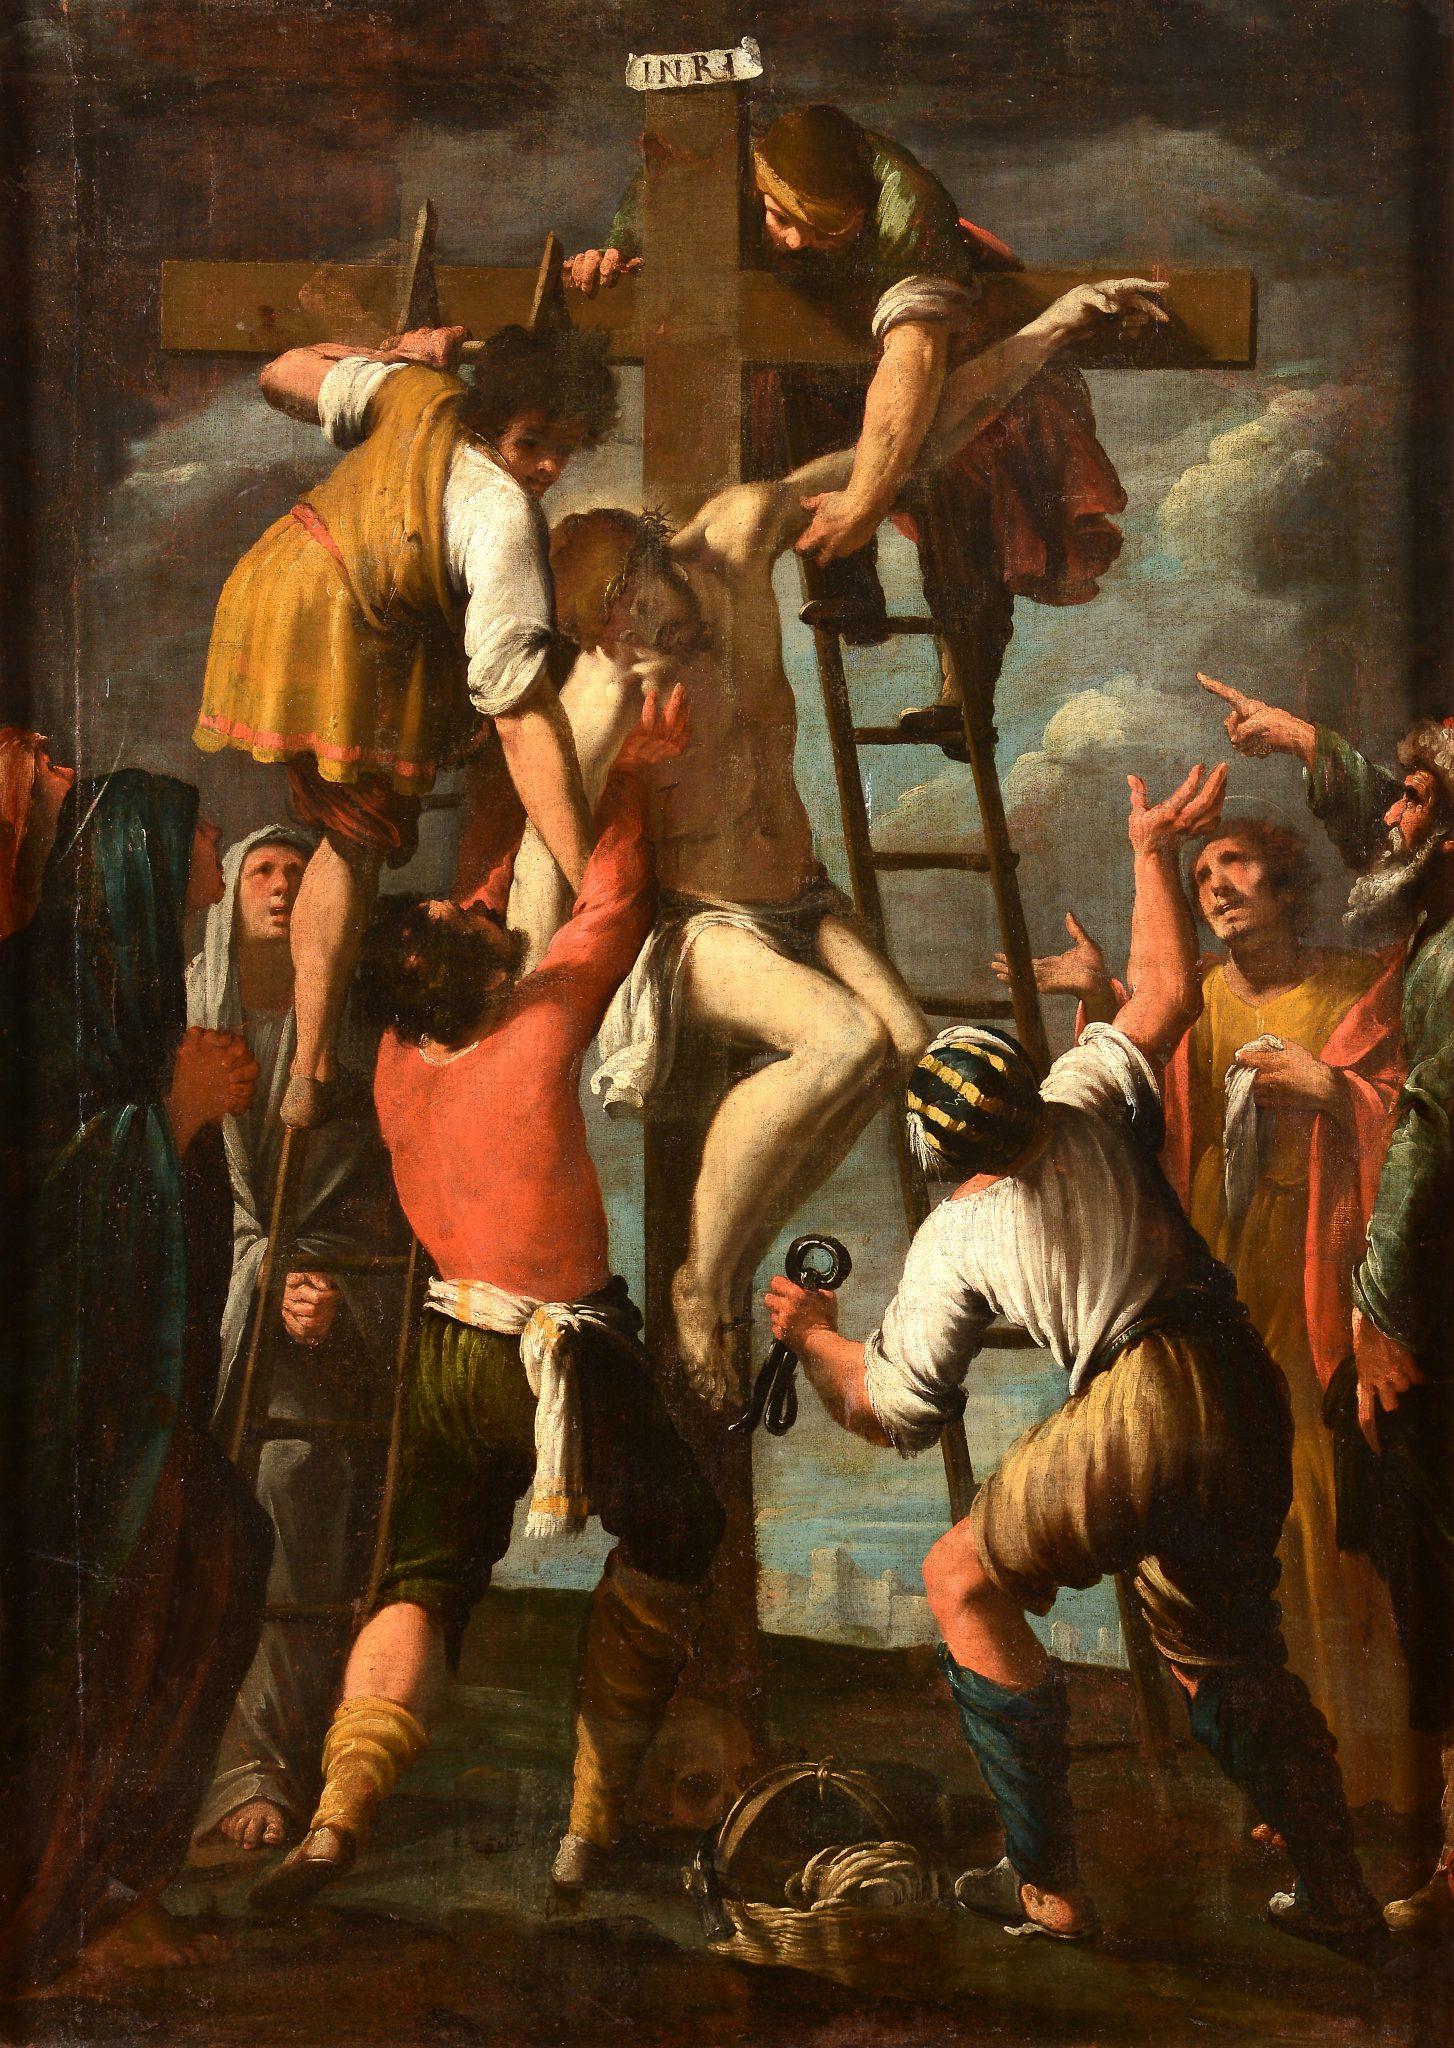 Lotto 85 Bernardo Strozzi (1581-1644) Deposizione olio su tela, cm 173x123 Stima € 40.000-60.000